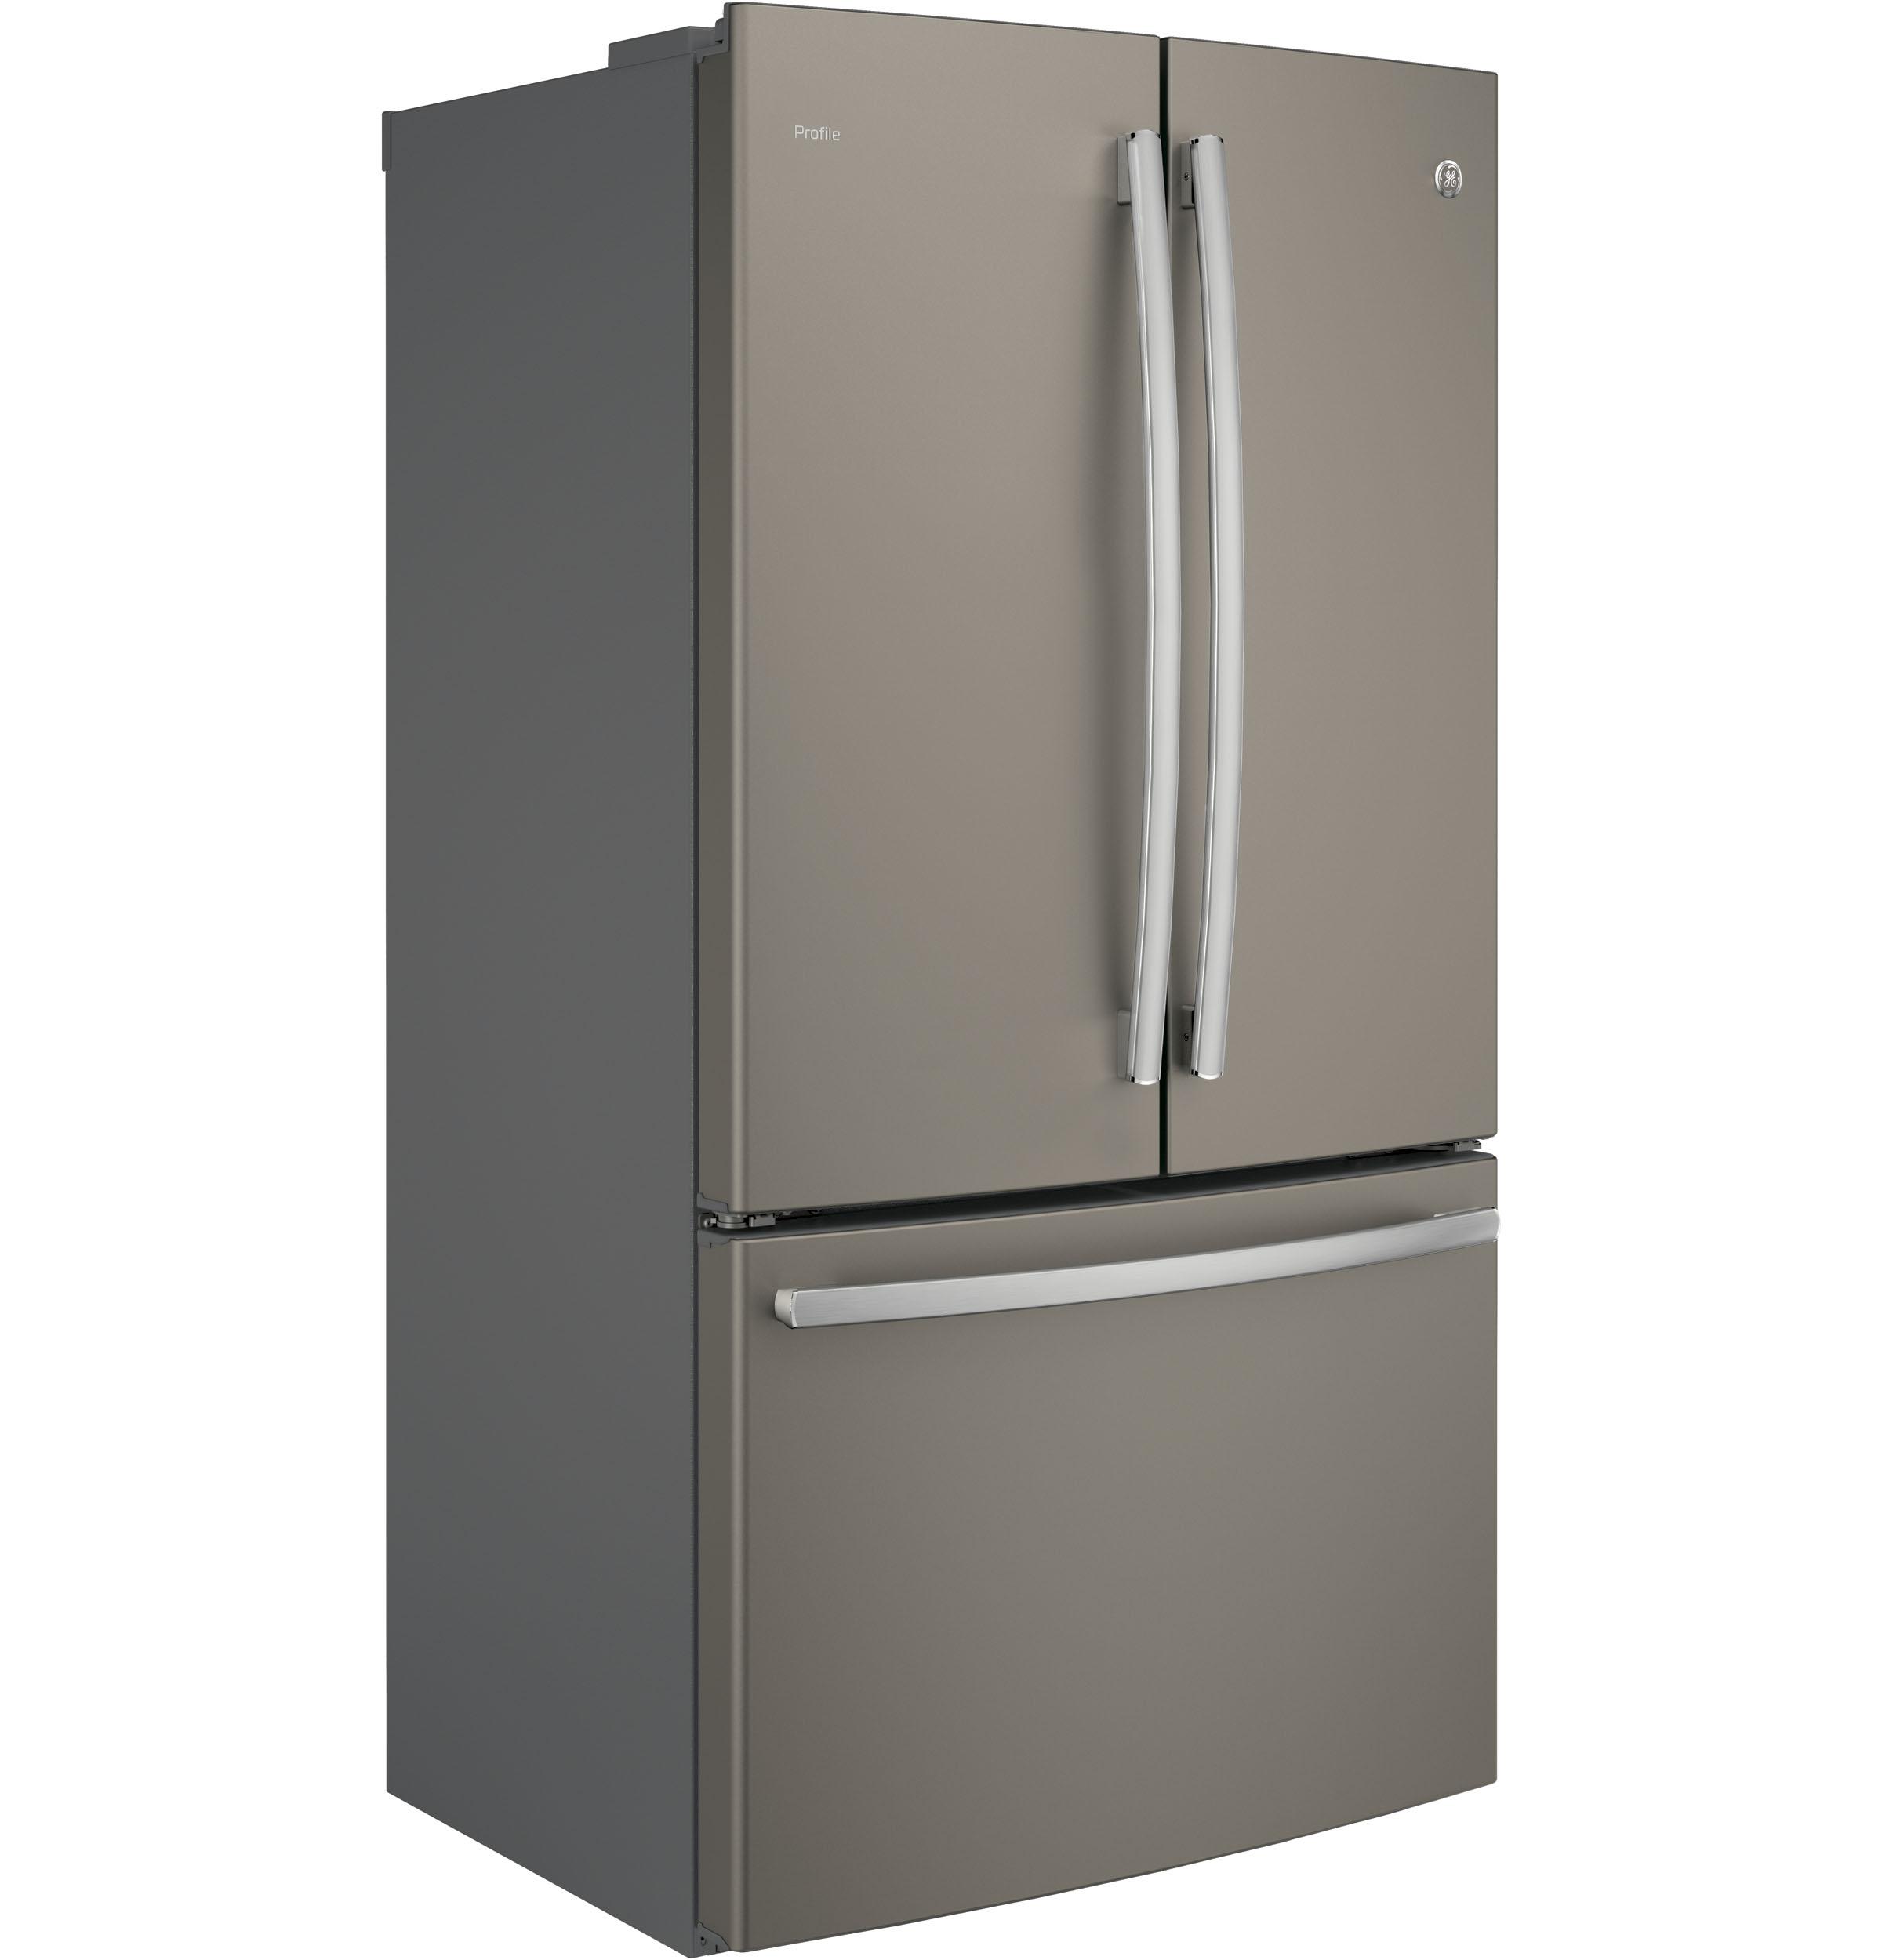 Model: PWE23KMKES | GE Profile™ Series ENERGY STAR® 23.1 Cu. Ft. Counter-Depth French-Door Refrigerator